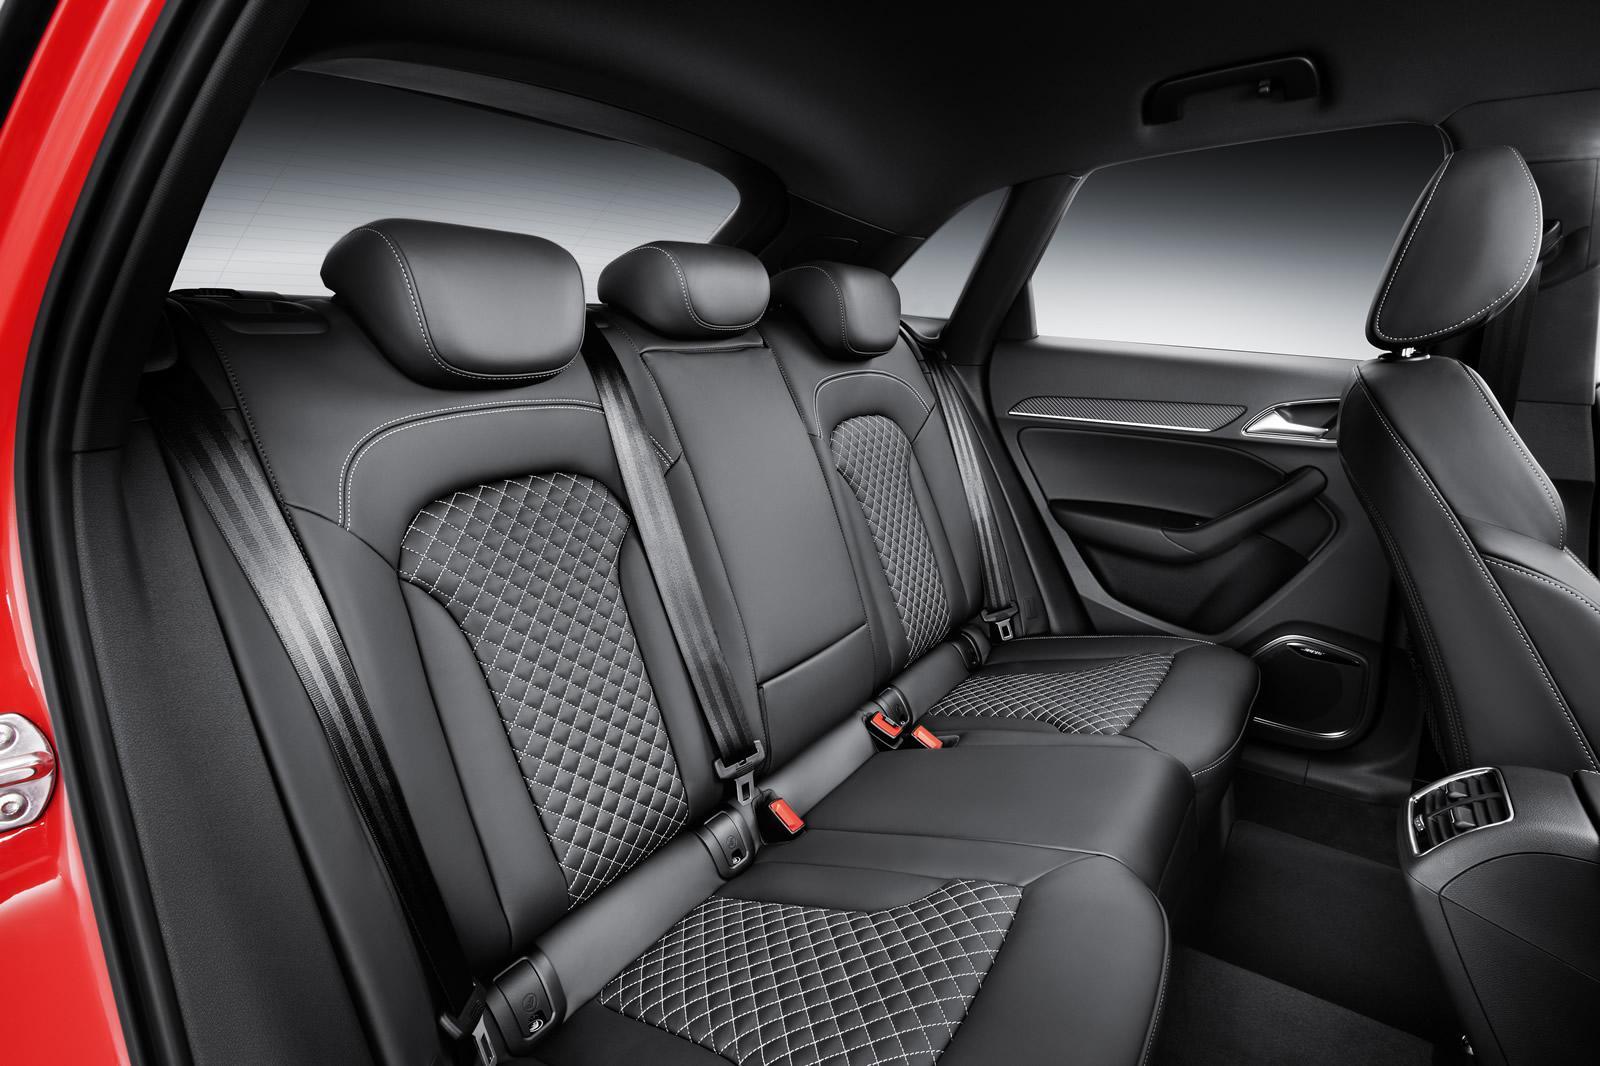 2015 Audi RS Q3 facelift rear seat